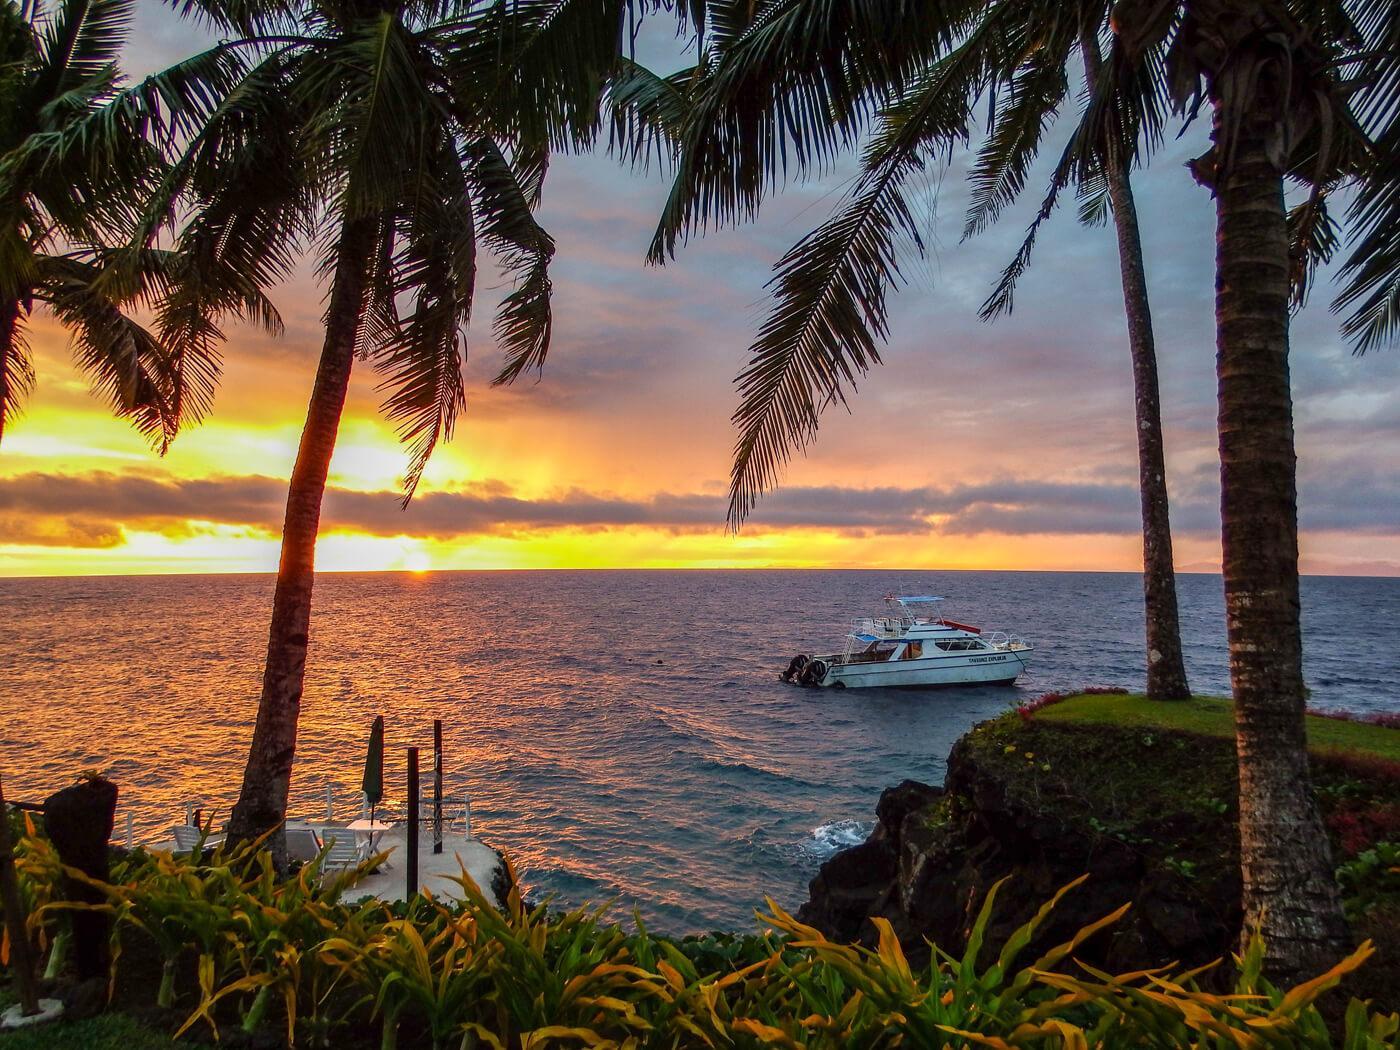 Sunset from Paradise Resort, Taveuni. © Roger Harris